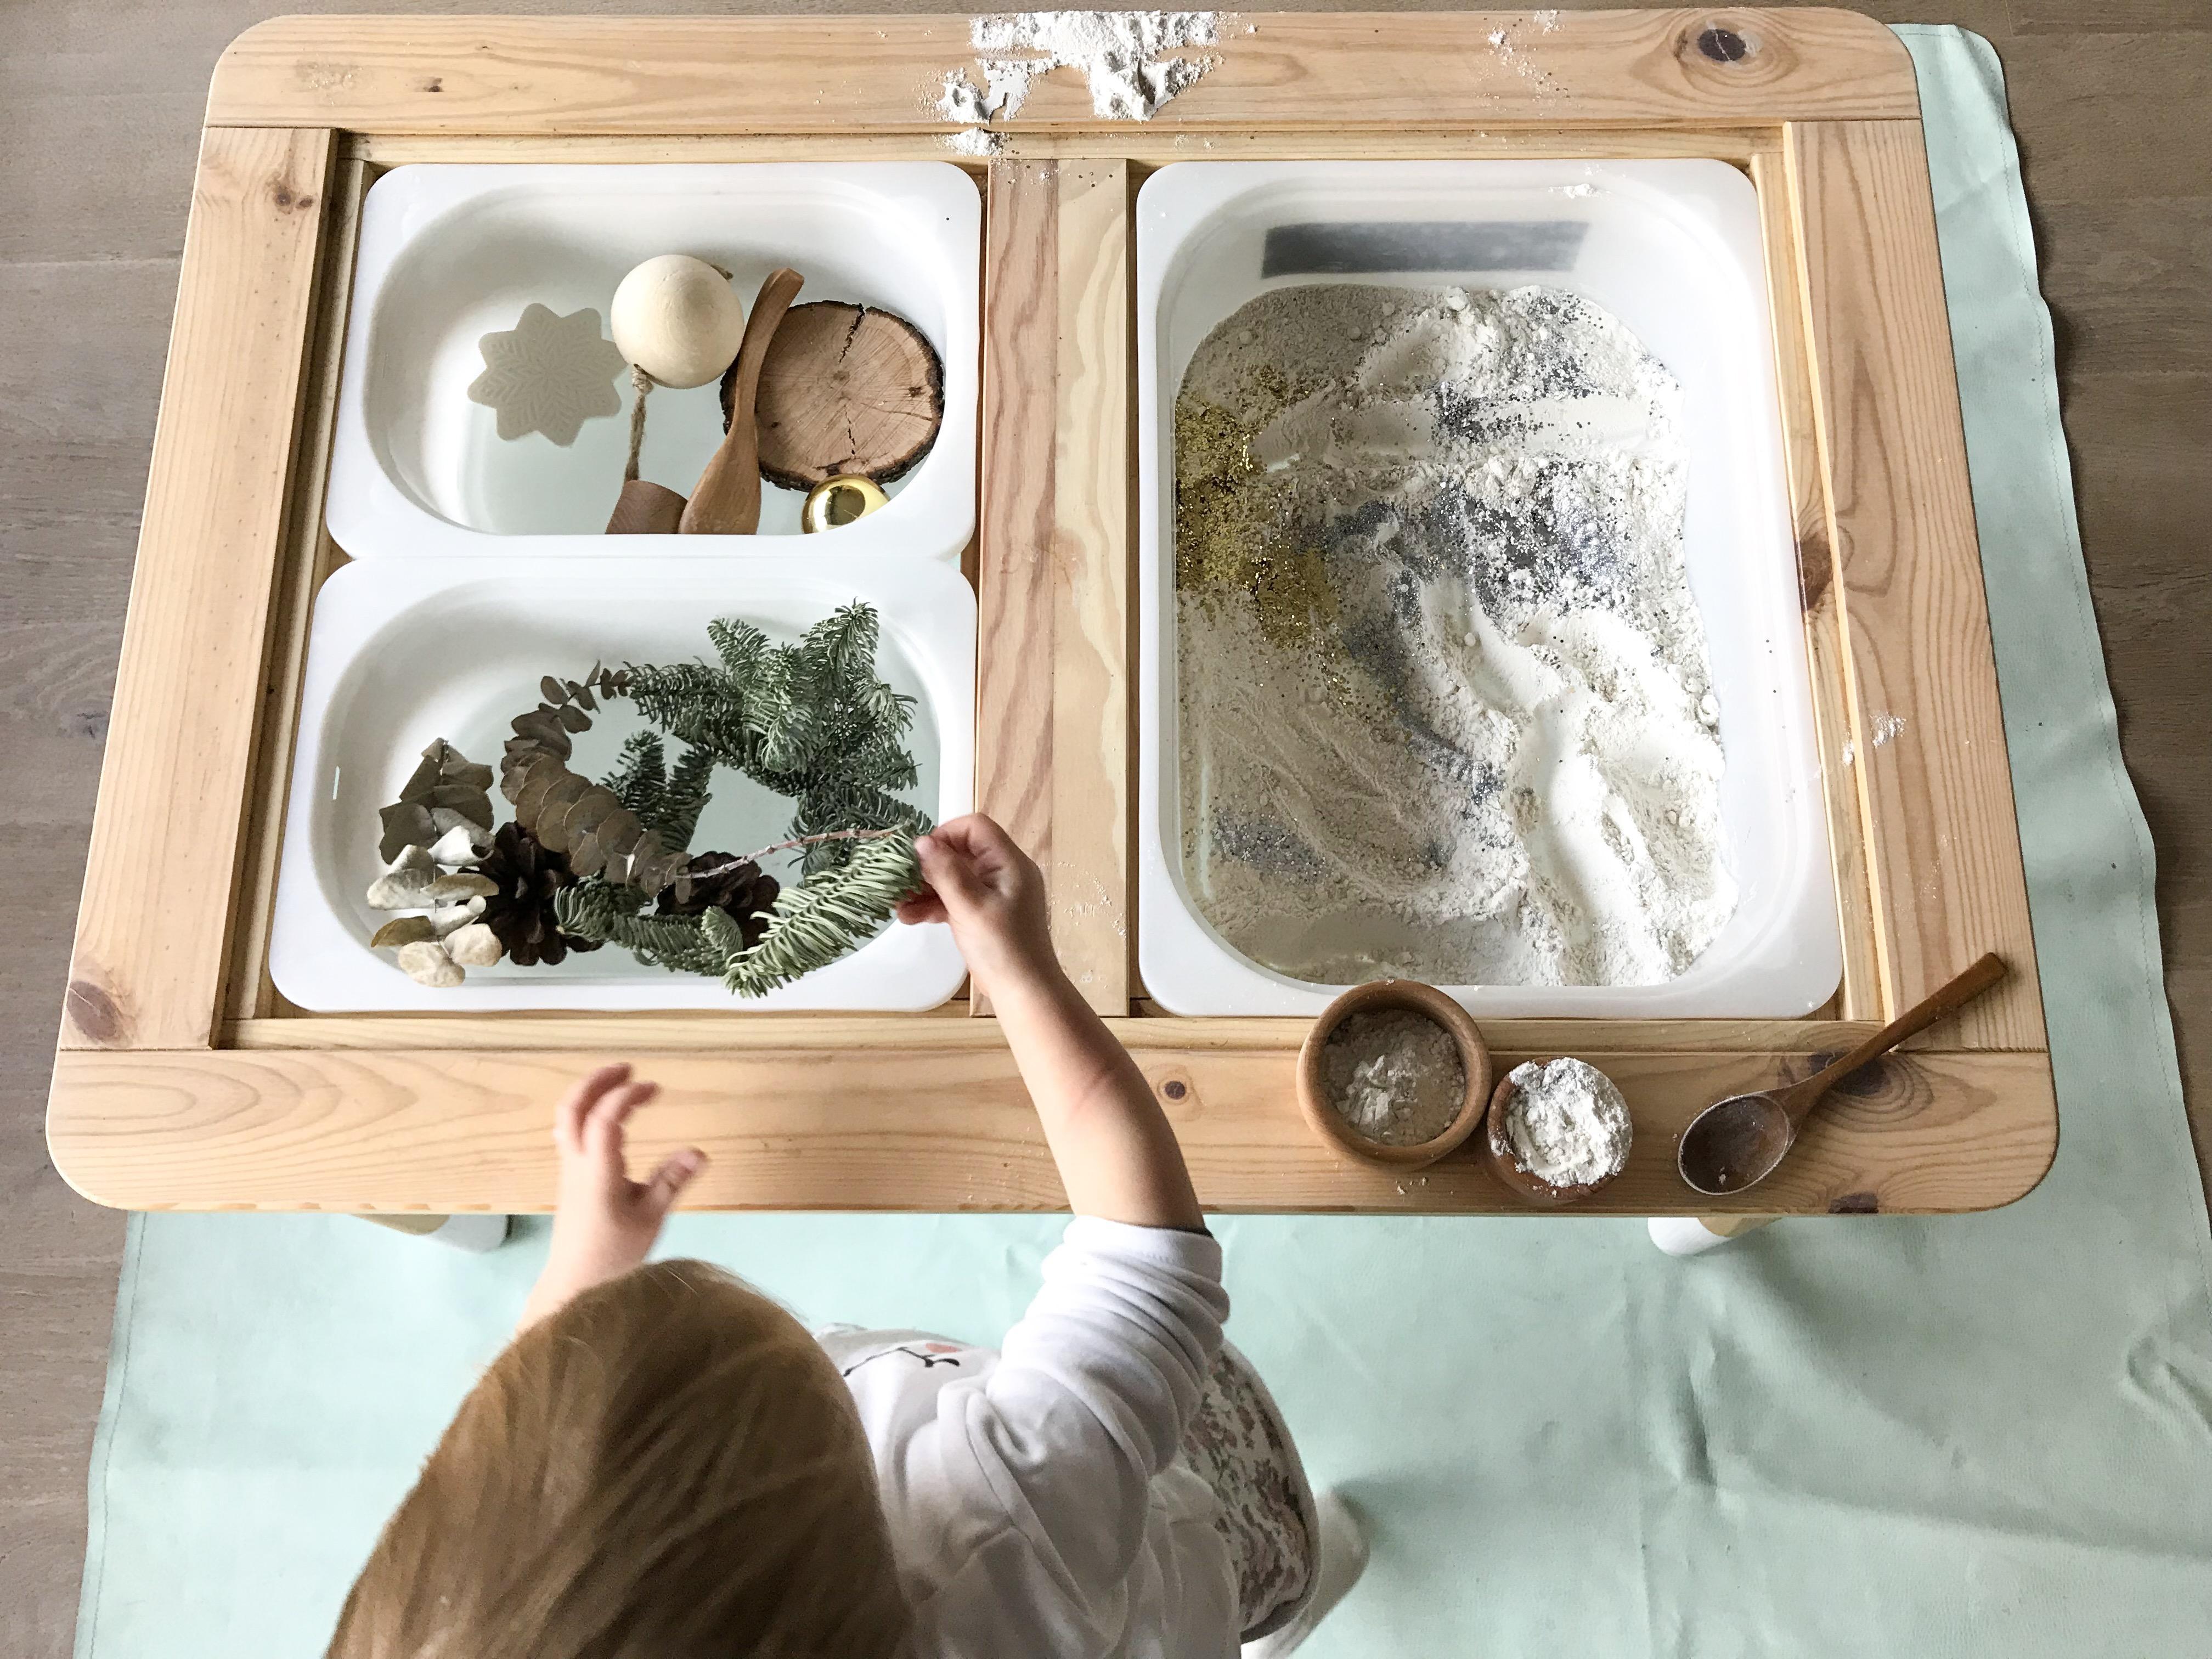 mesa de experimentacion estoreta - actividades estimulacion sensorial para niños - sensory play activities for children